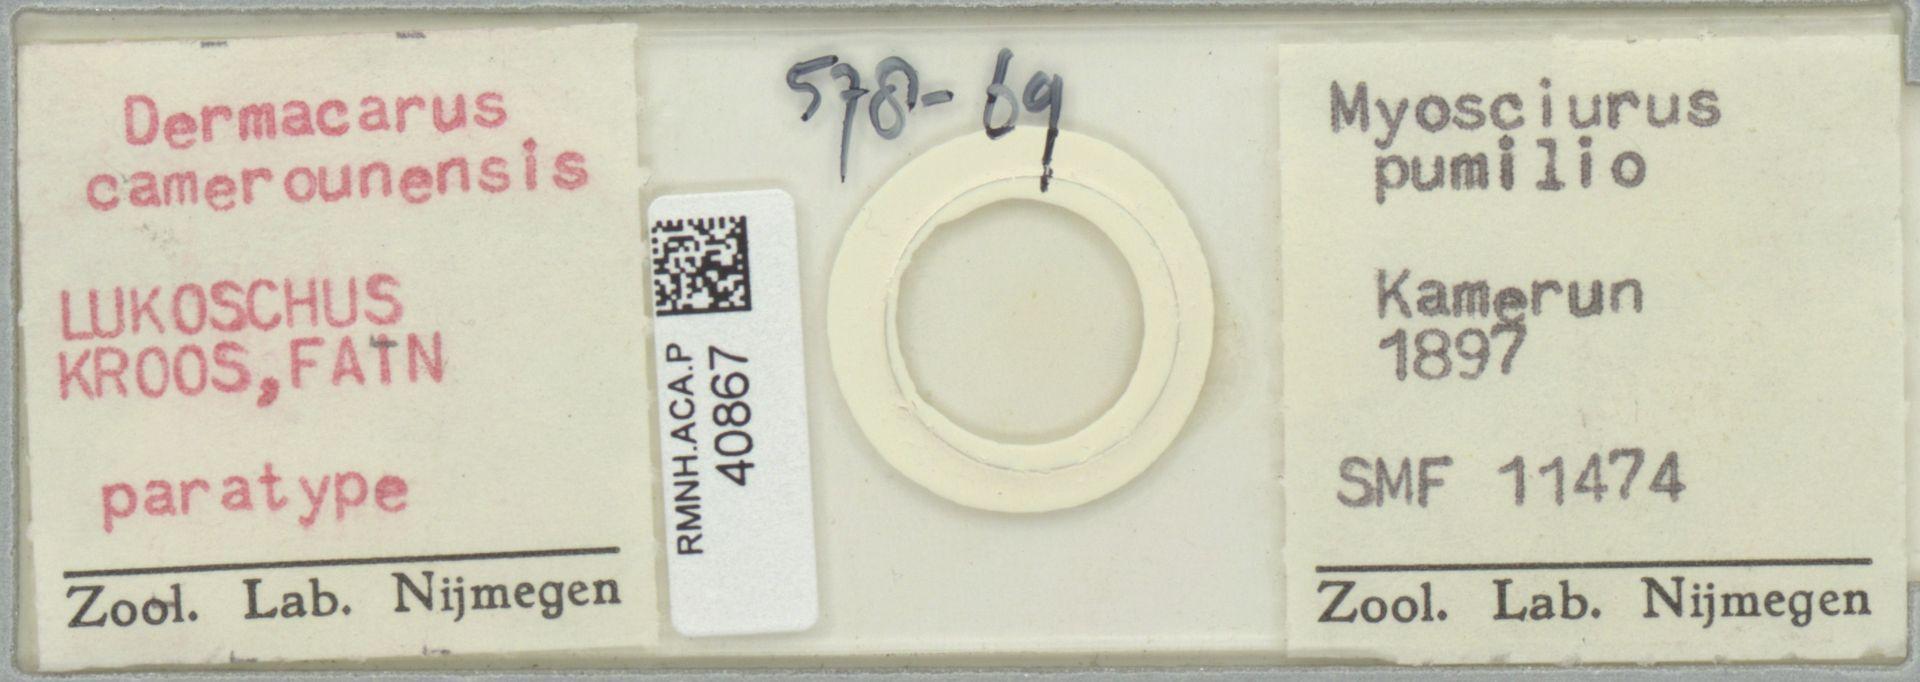 RMNH.ACA.P.40867 | Dermacarus camerounensis Lukoschus Kroos, Fain